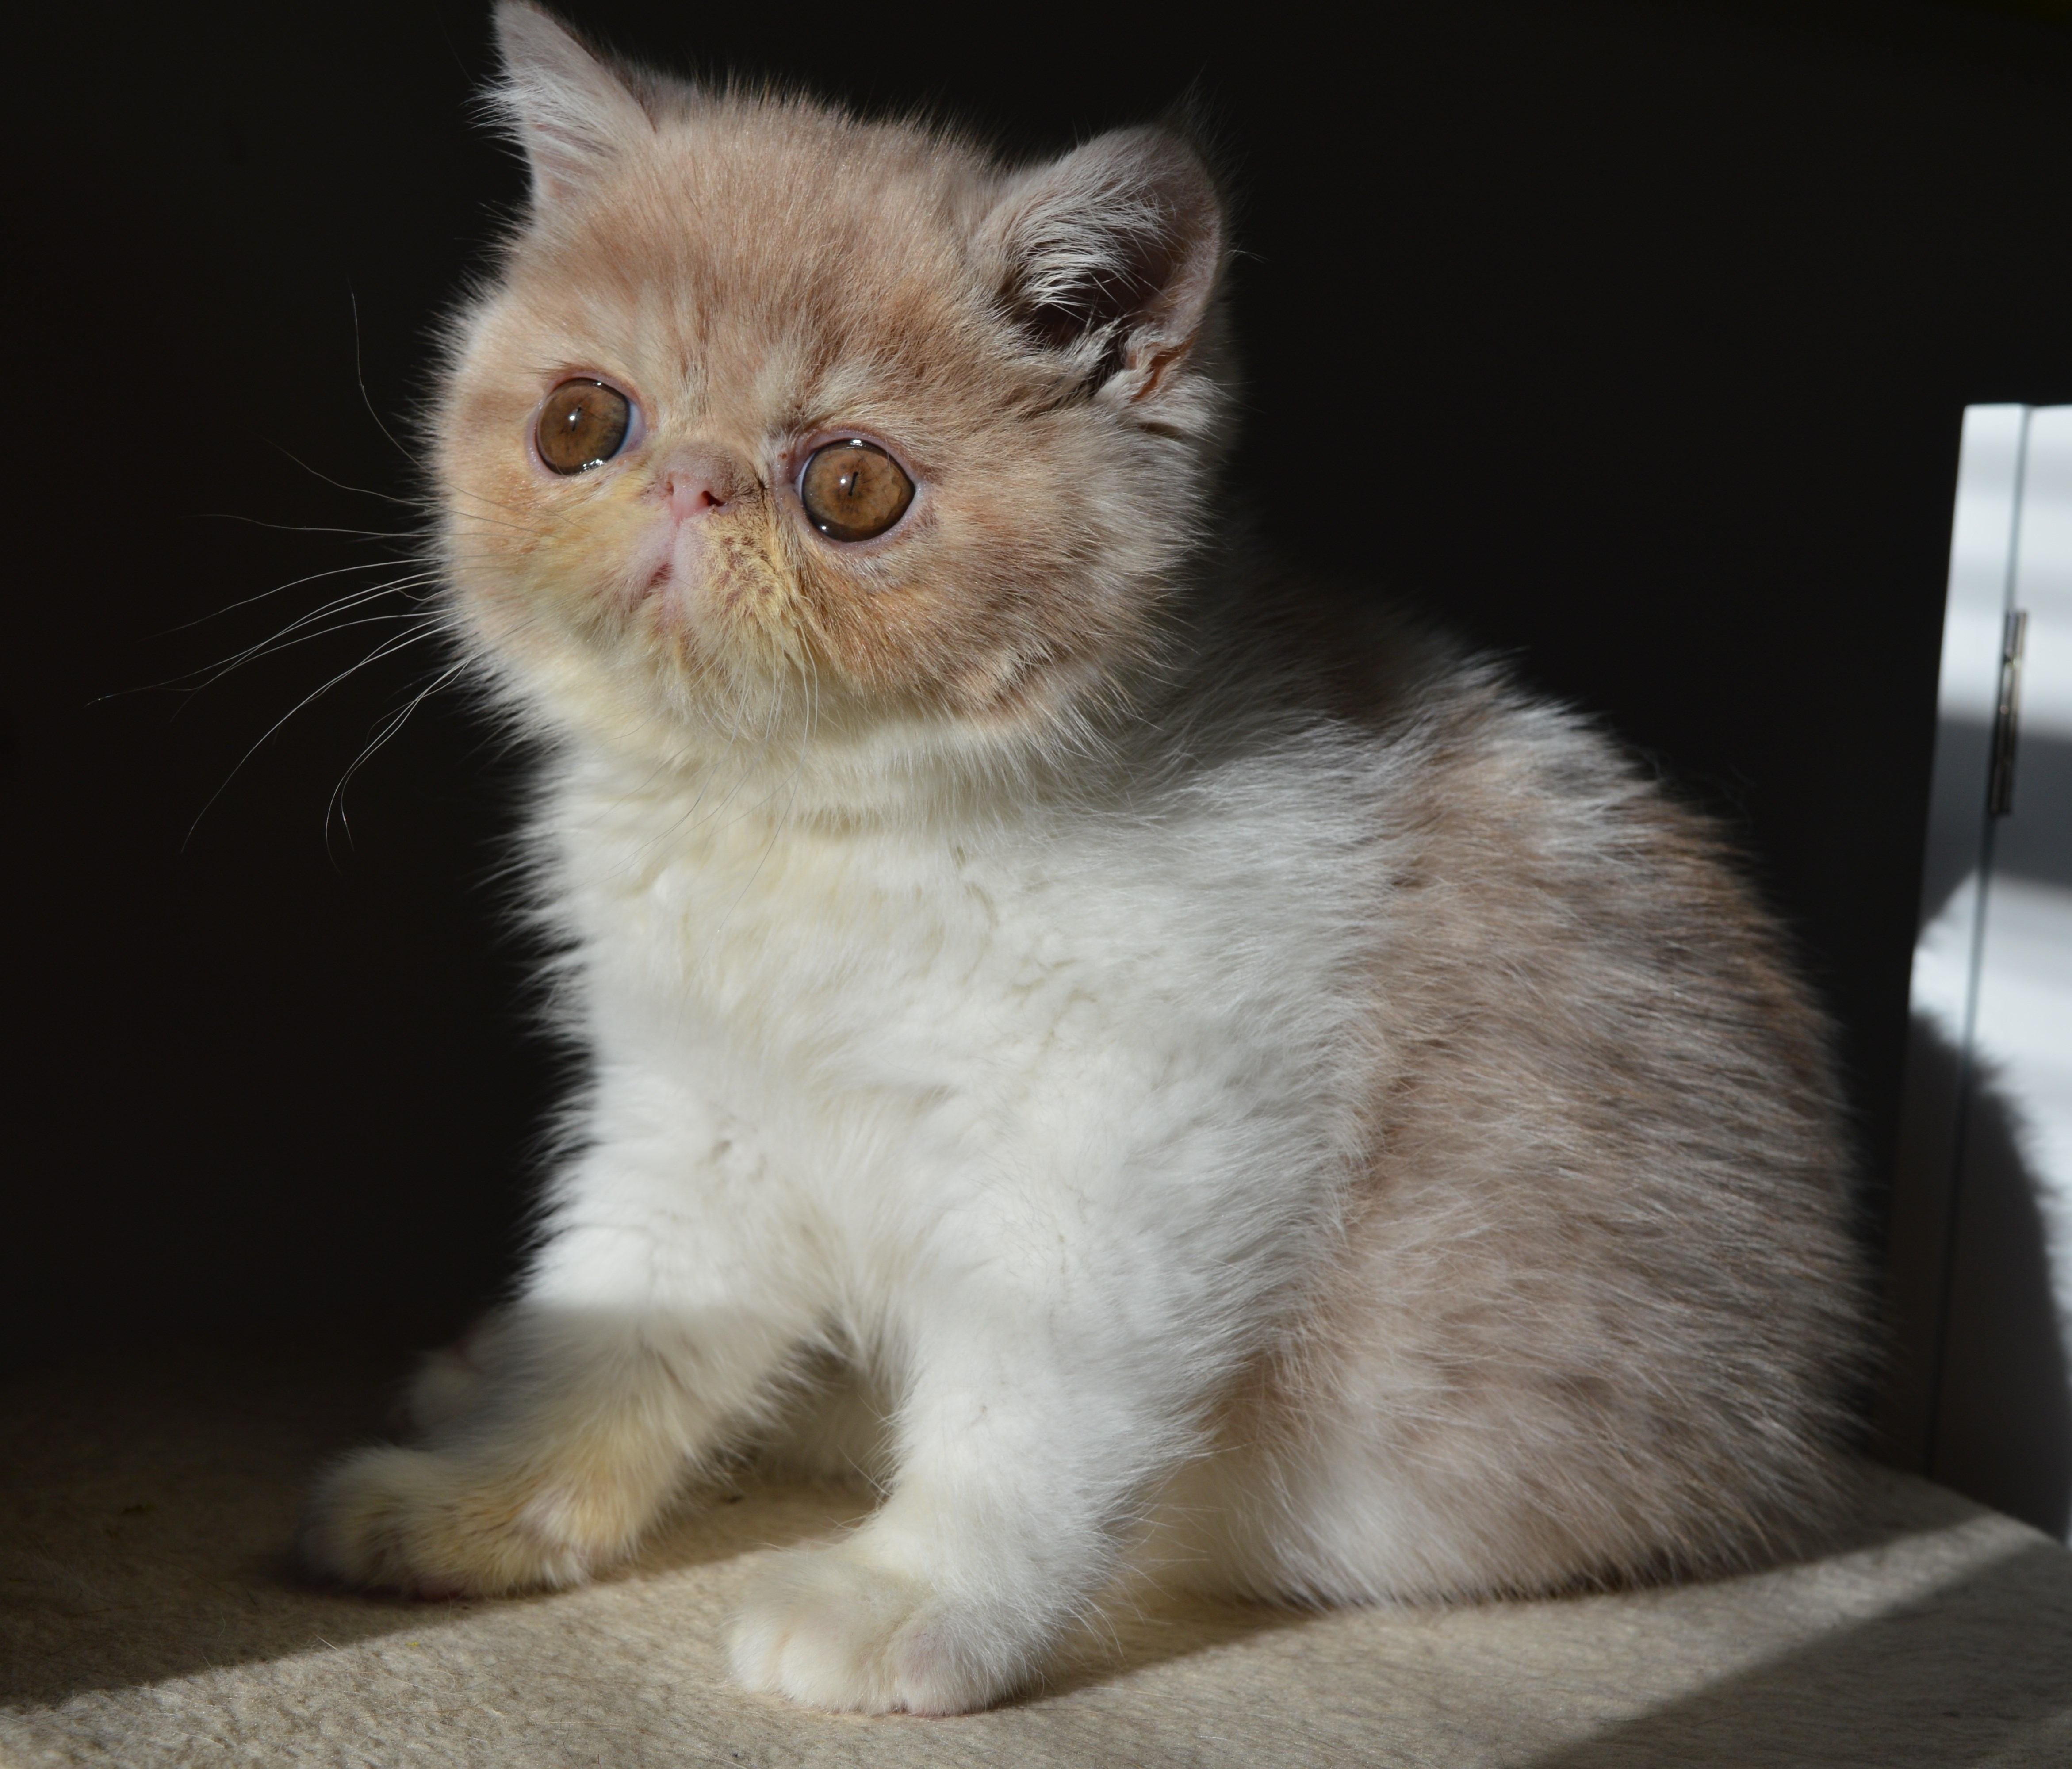 exotic shorthair | artbygabi & ella cats cattery of exotics | page 2